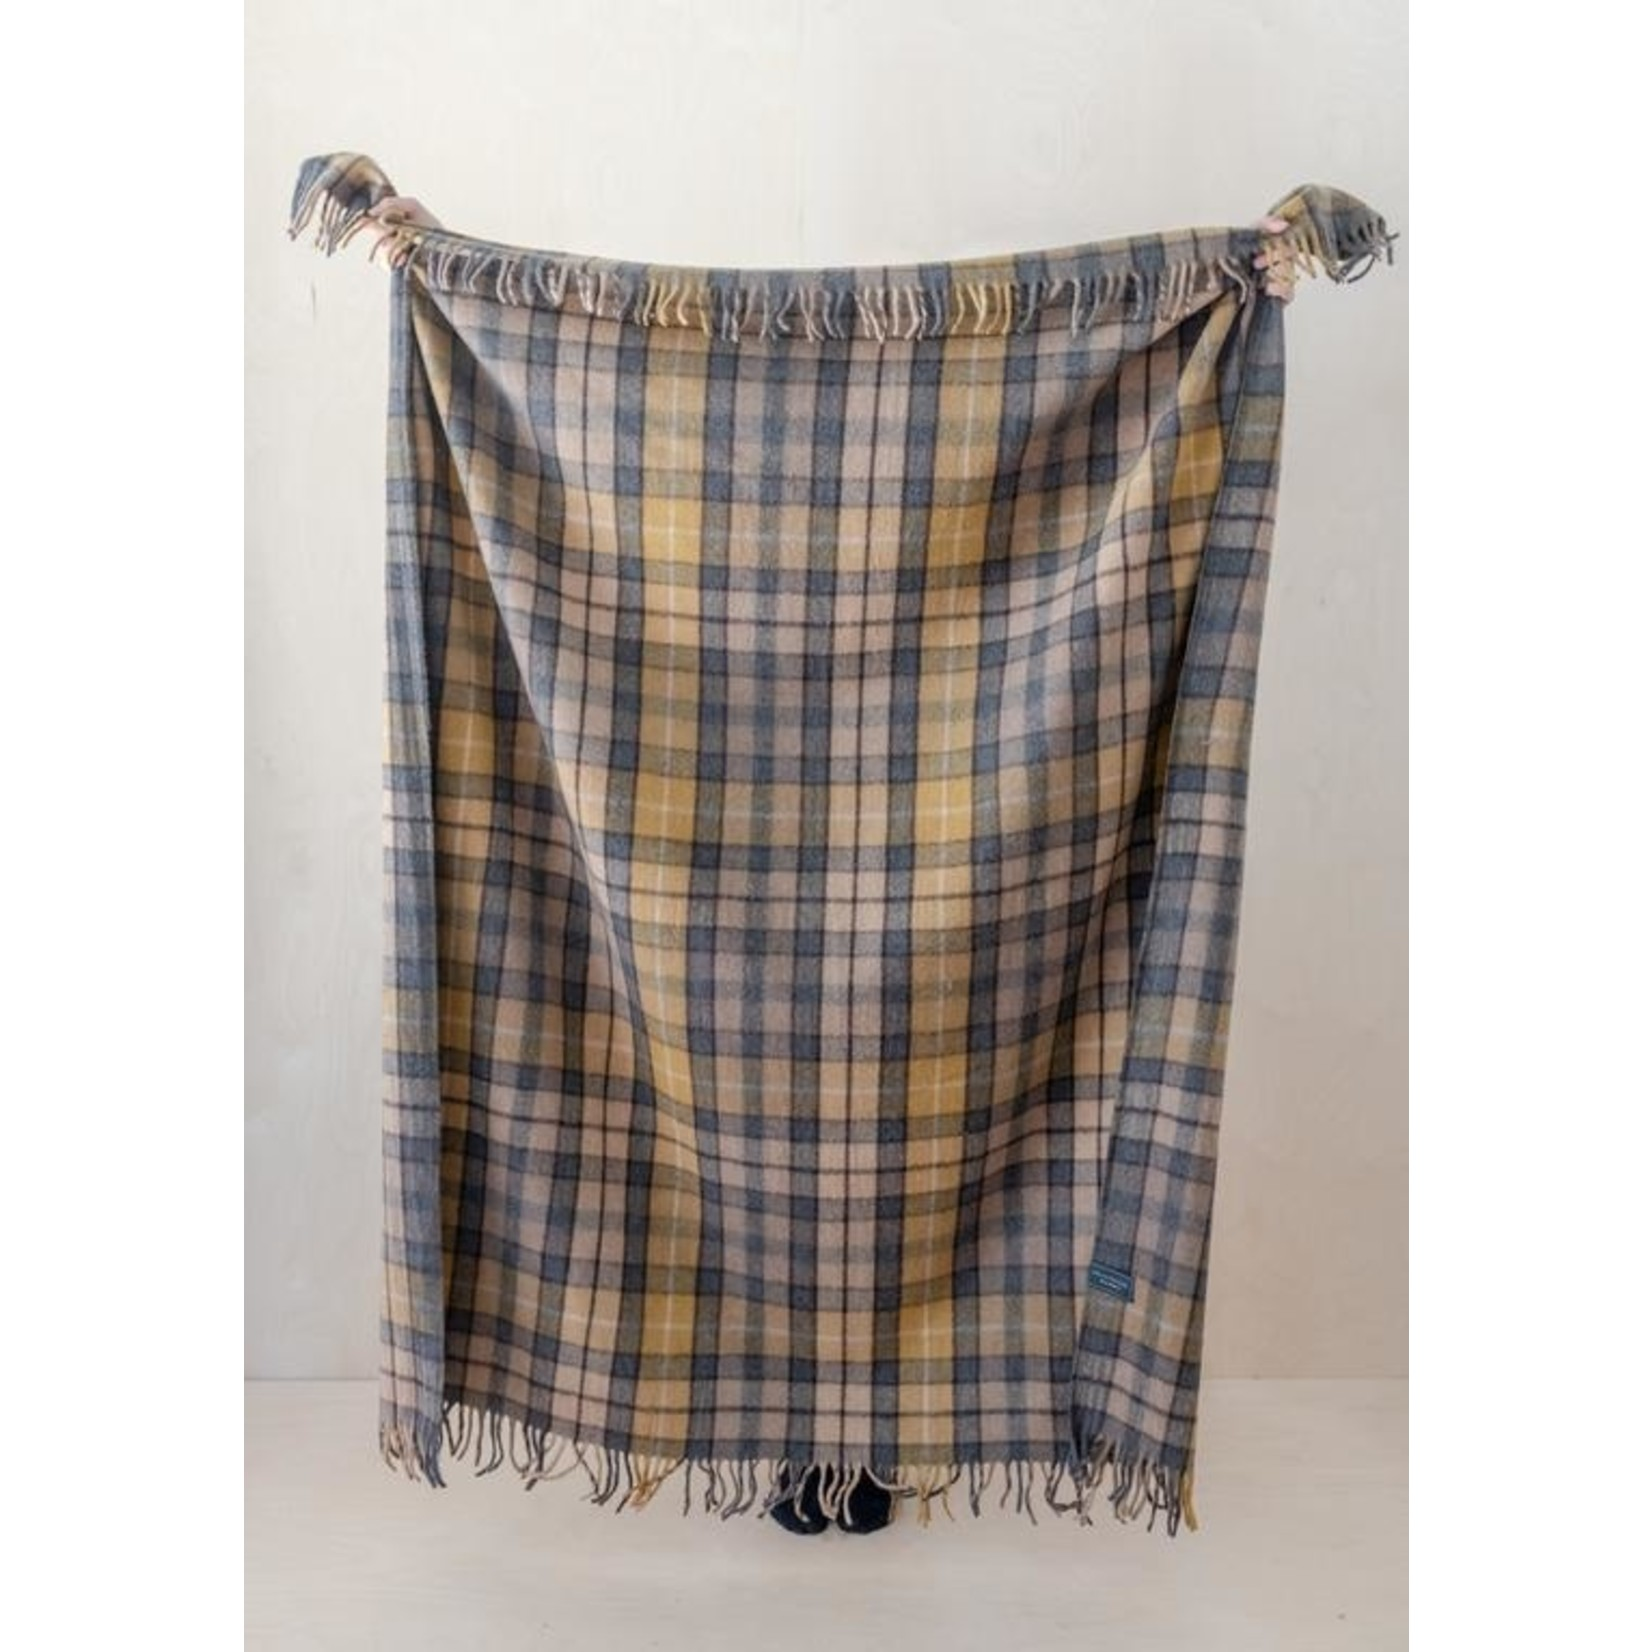 Aran Crafts Edinburgh 4812NB Wool Throw - Natural Buchanan